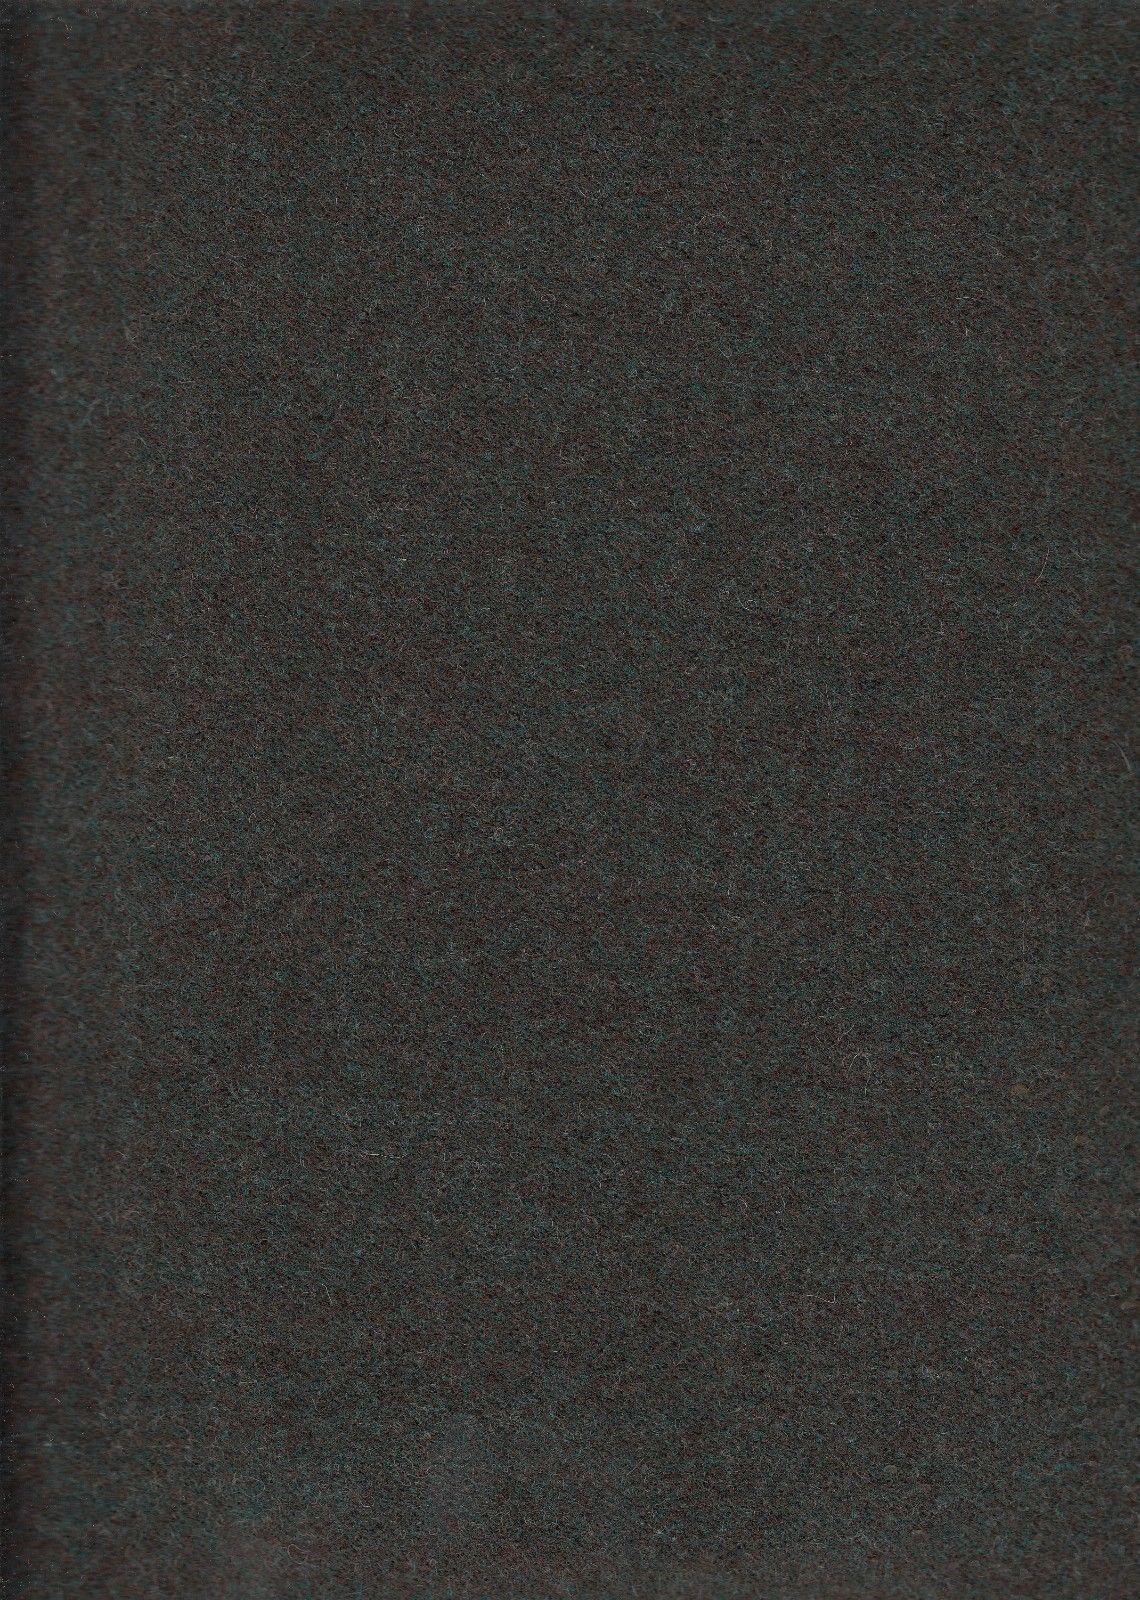 2.875 Mid Century Upholstery Fabric Green Brown Melange Wool DL